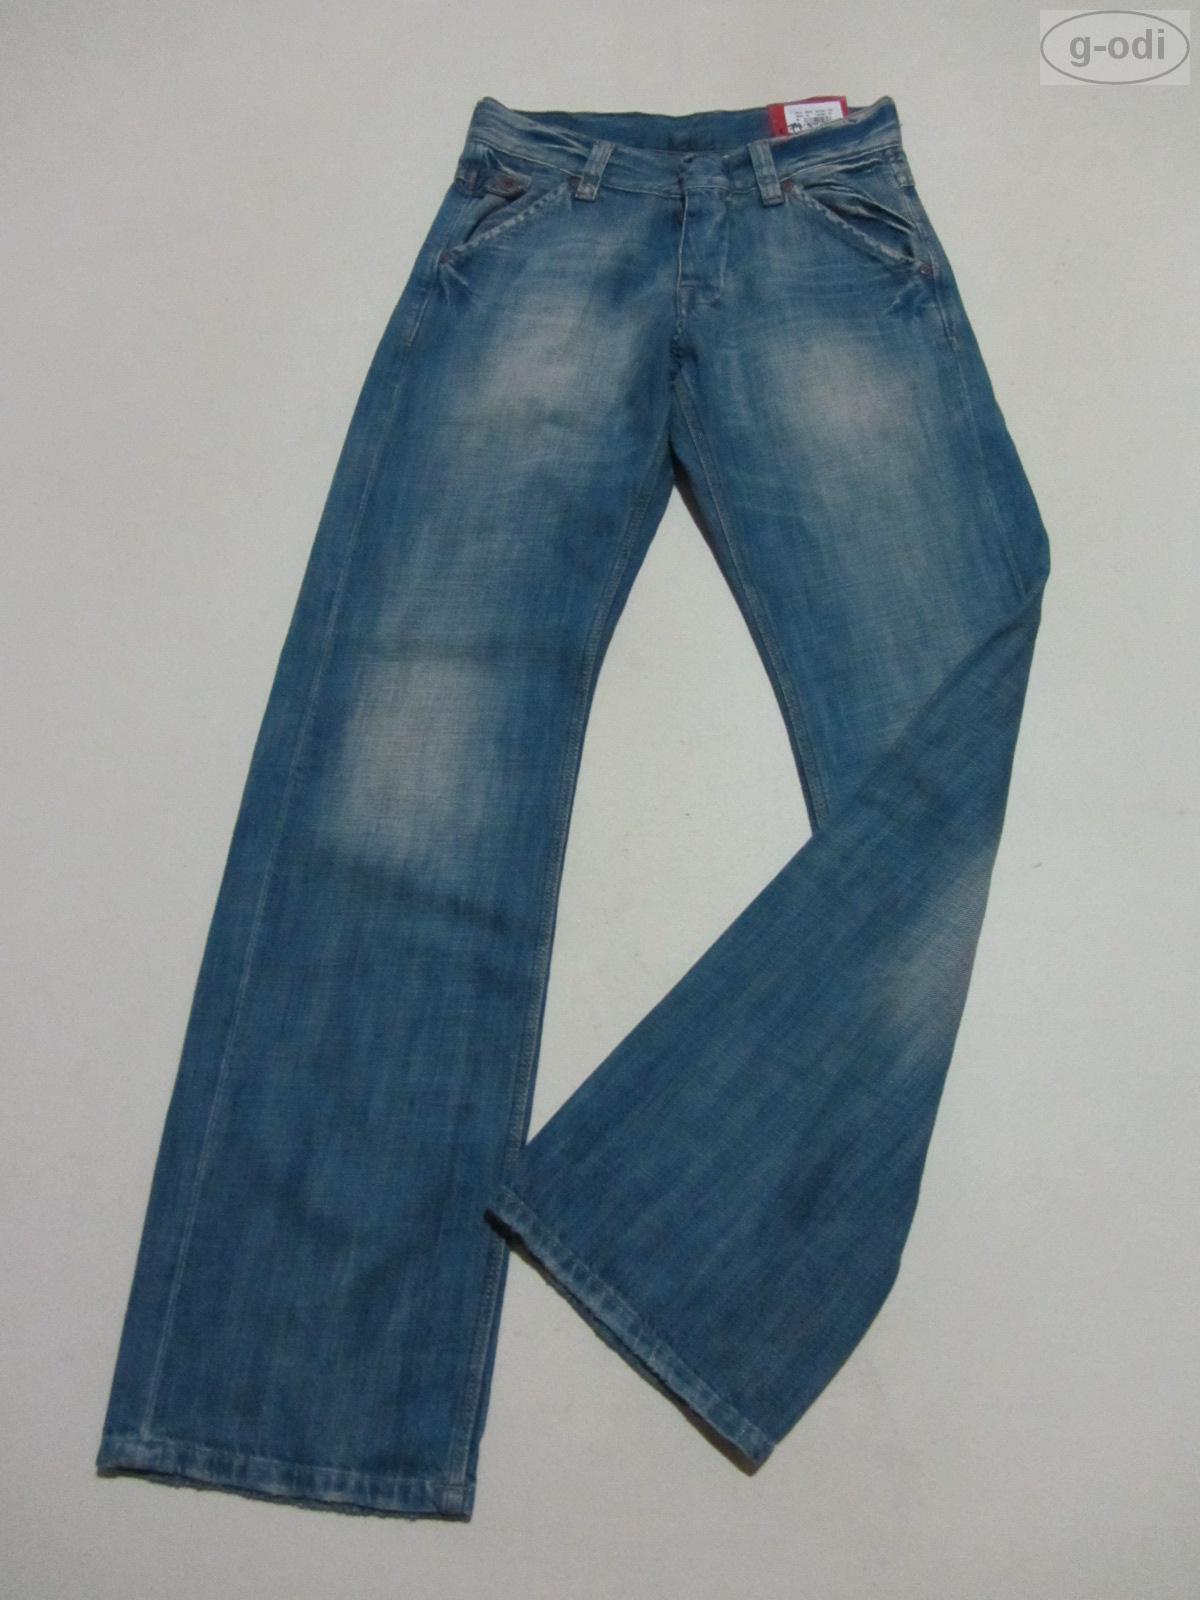 Pepe Jeans HOLBORN, W 28 L 34, NEU    Vintage Denim, Loose Fit, Button Fly